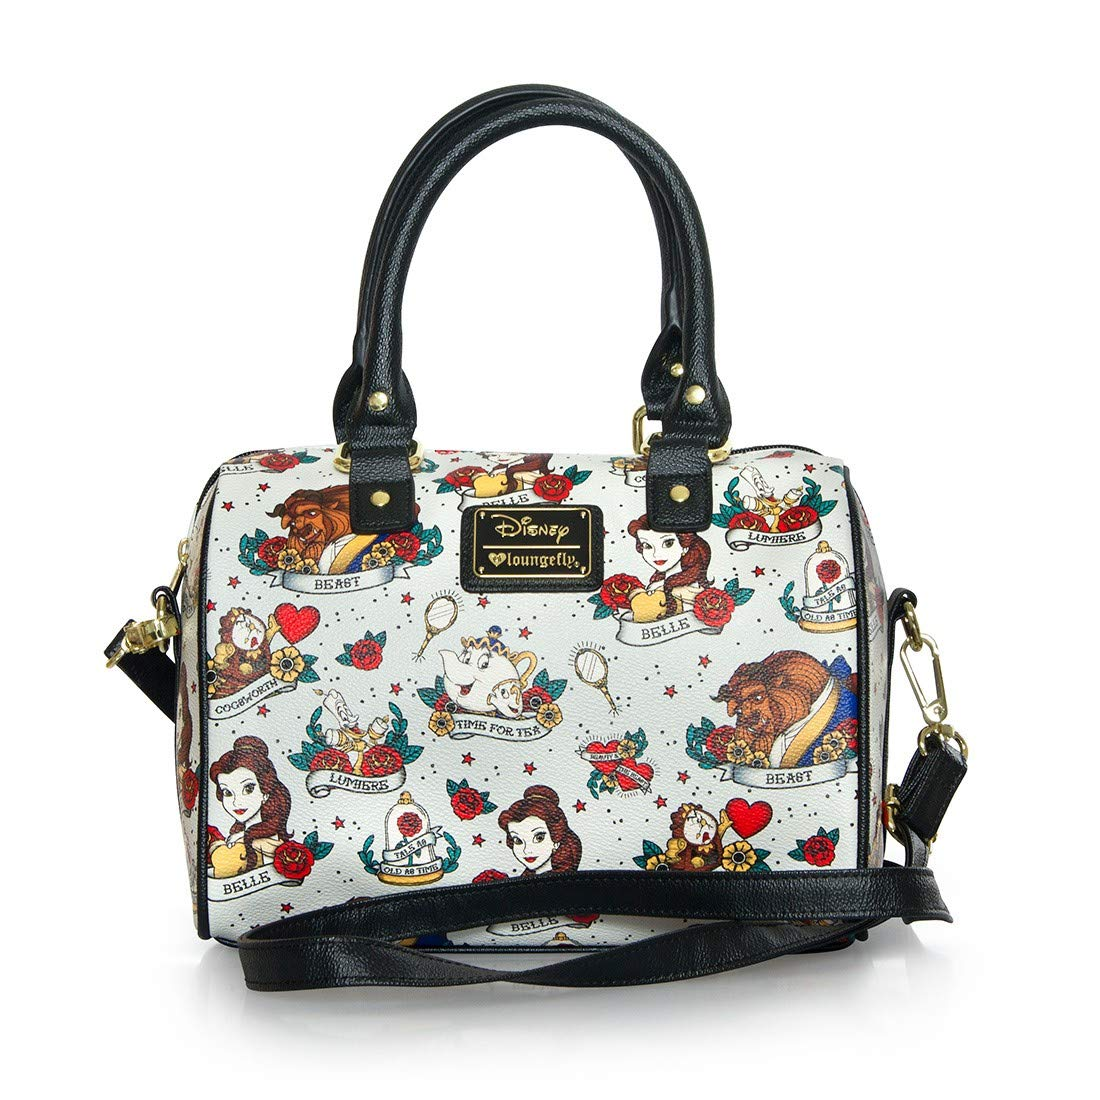 Beauty and the Beast Belle Tattoo Hangbag Bag  Amazon.ca  Shoes   Handbags 31621a283058e